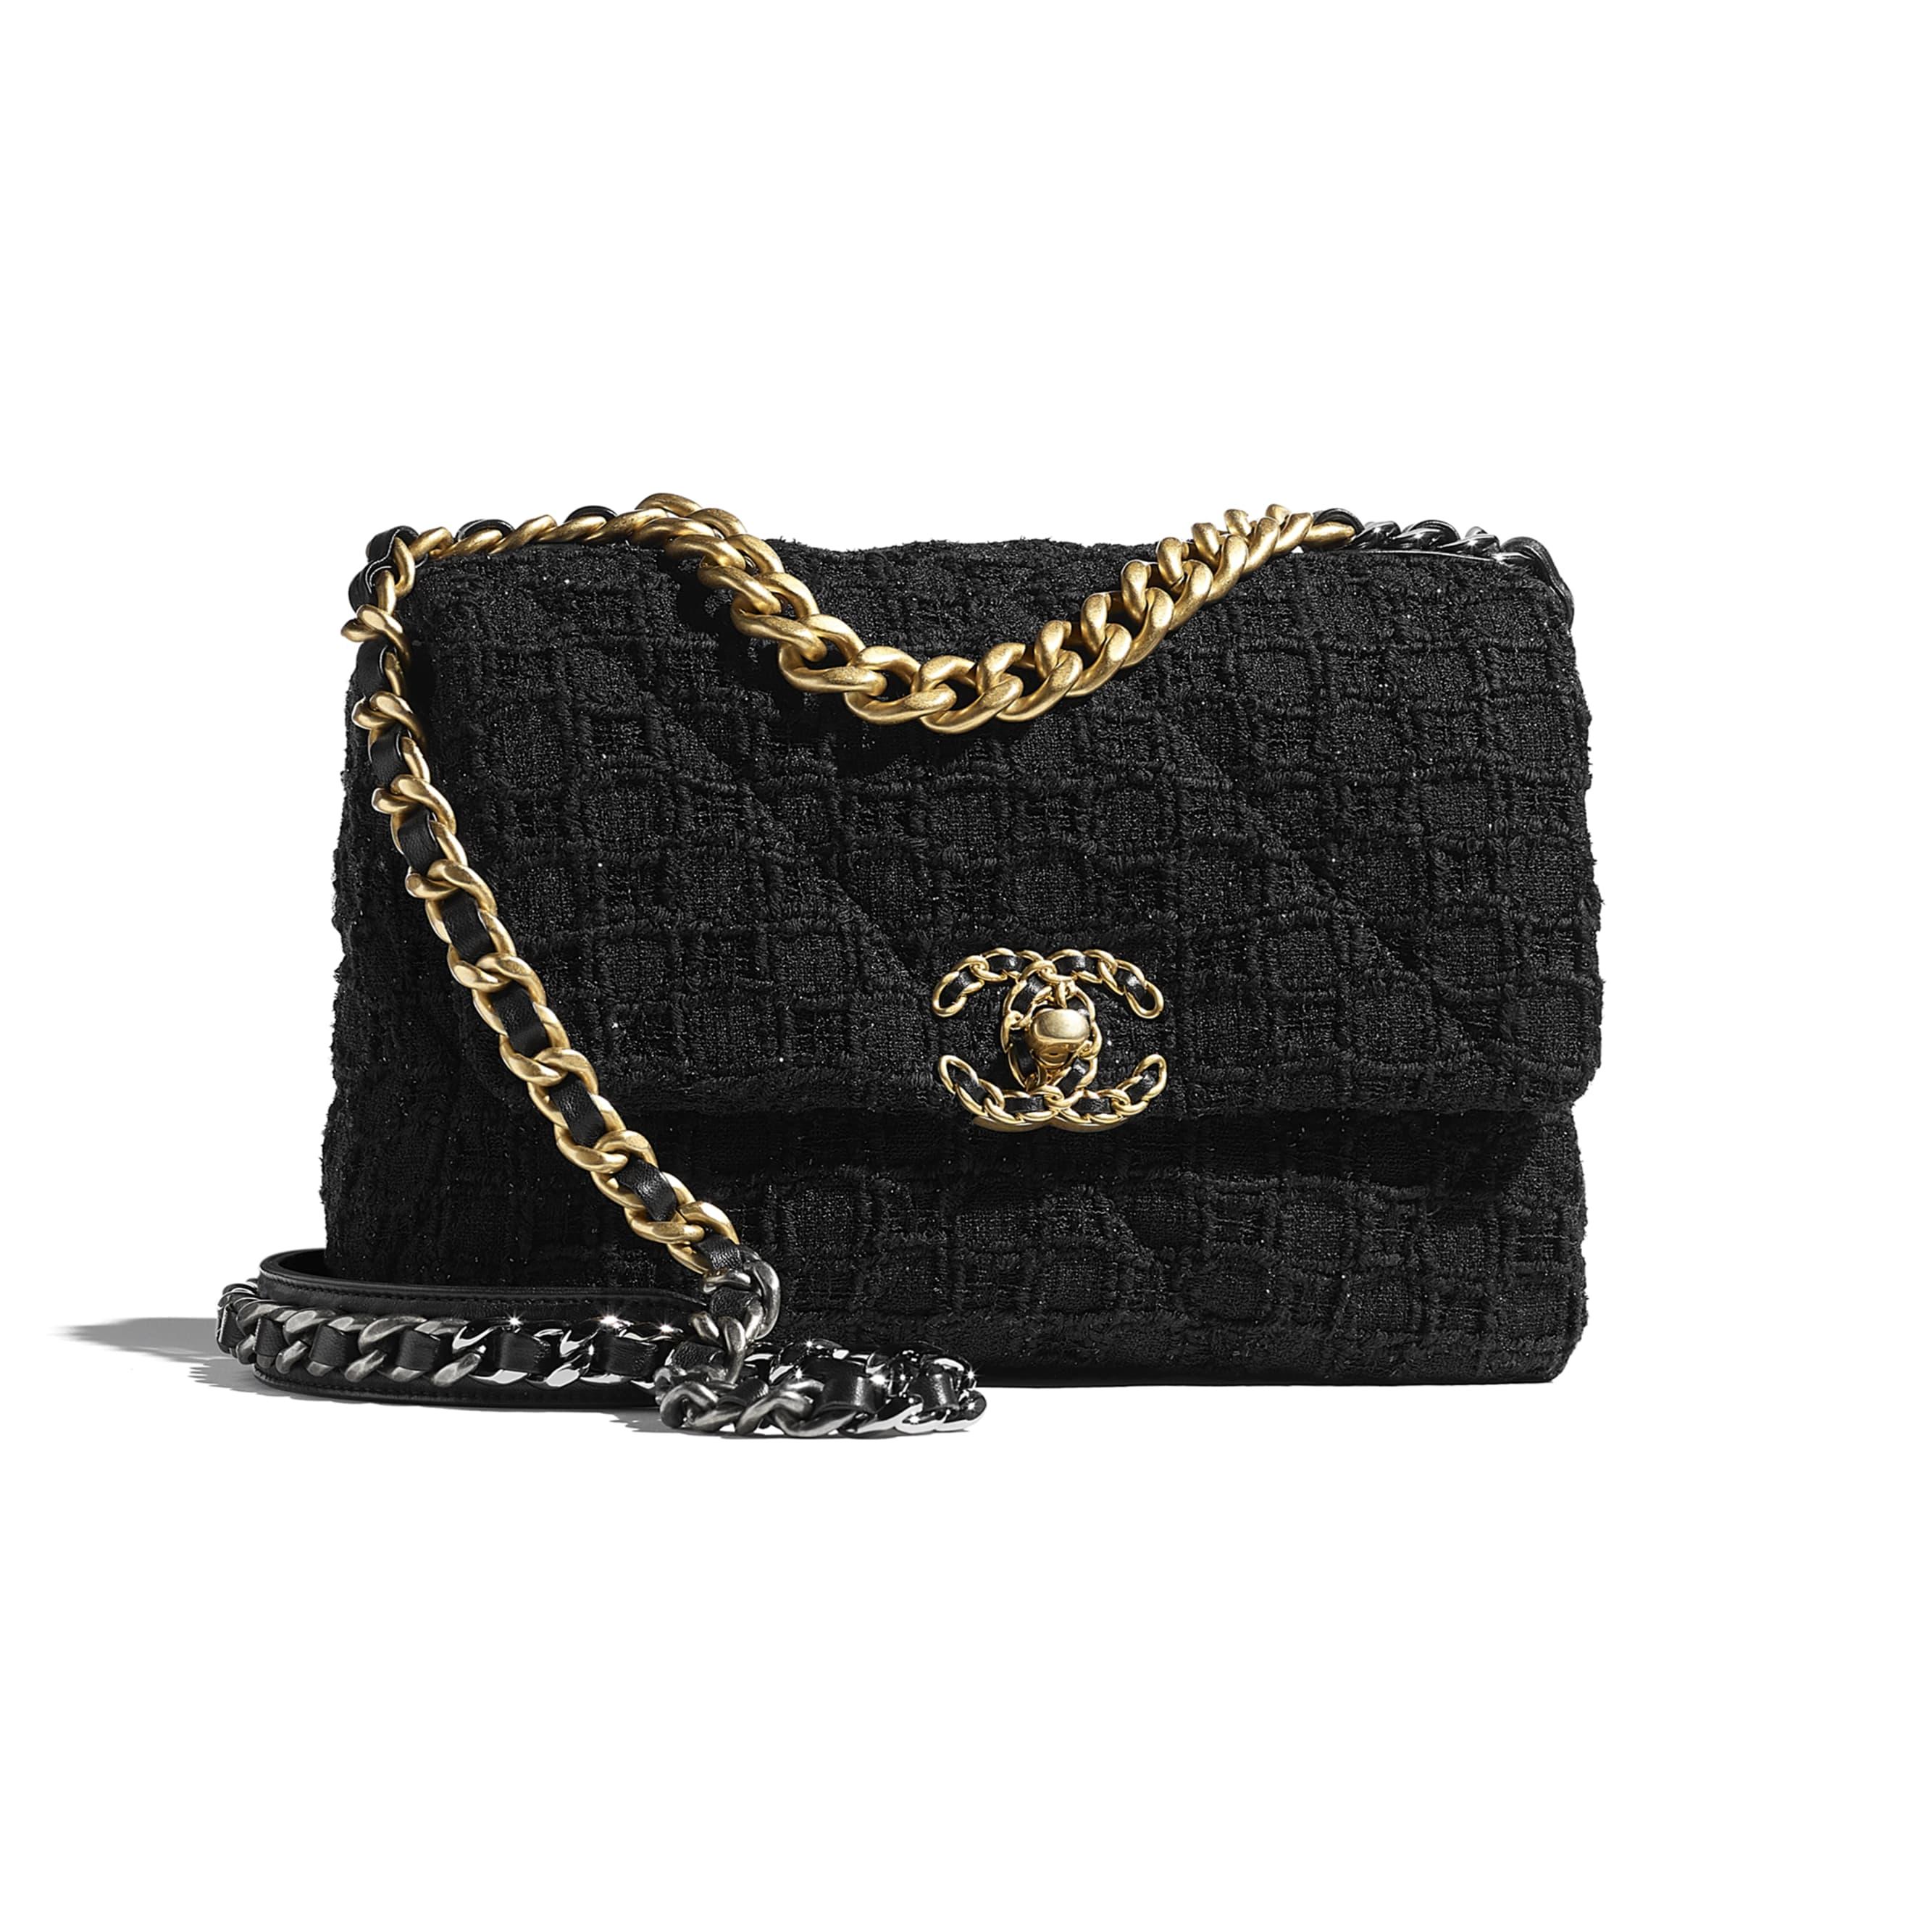 CHANEL 19 Handbag - Black - Tweed, Gold-Tone, Silver-Tone & Ruthenium-Finish Metal - CHANEL - Default view - see standard sized version